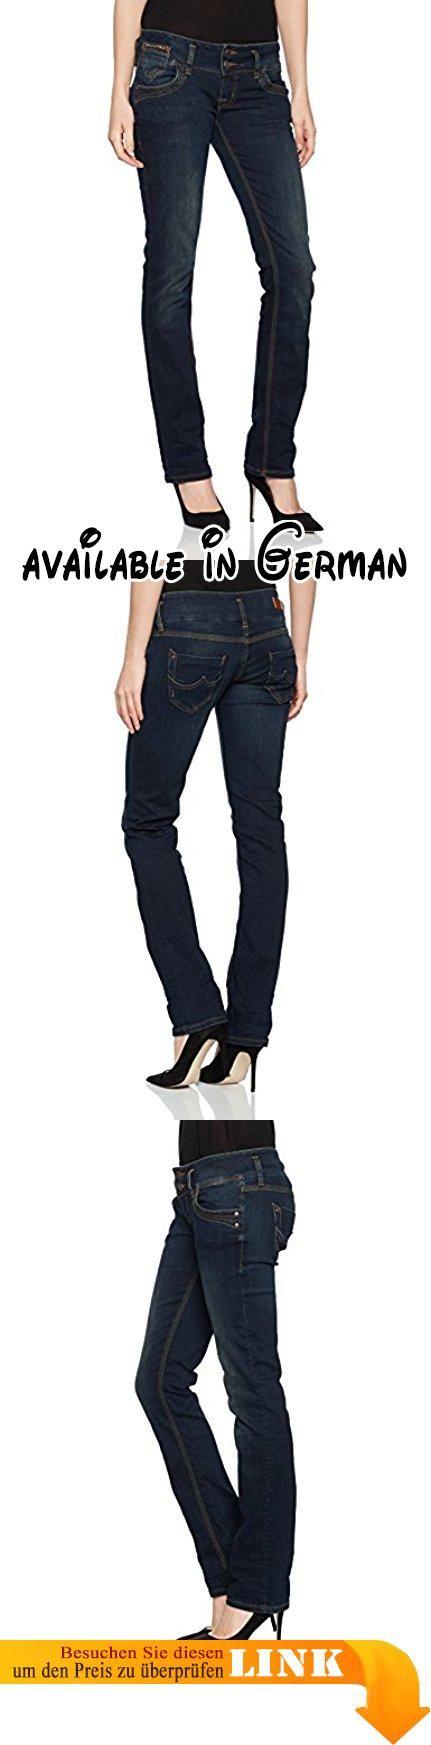 LTB Jeans Damen Straight Jeans Jonquil Blau (Lesina Wash 51066), W31/L34 (Herstellergröße: 31).  #Apparel #PANTS